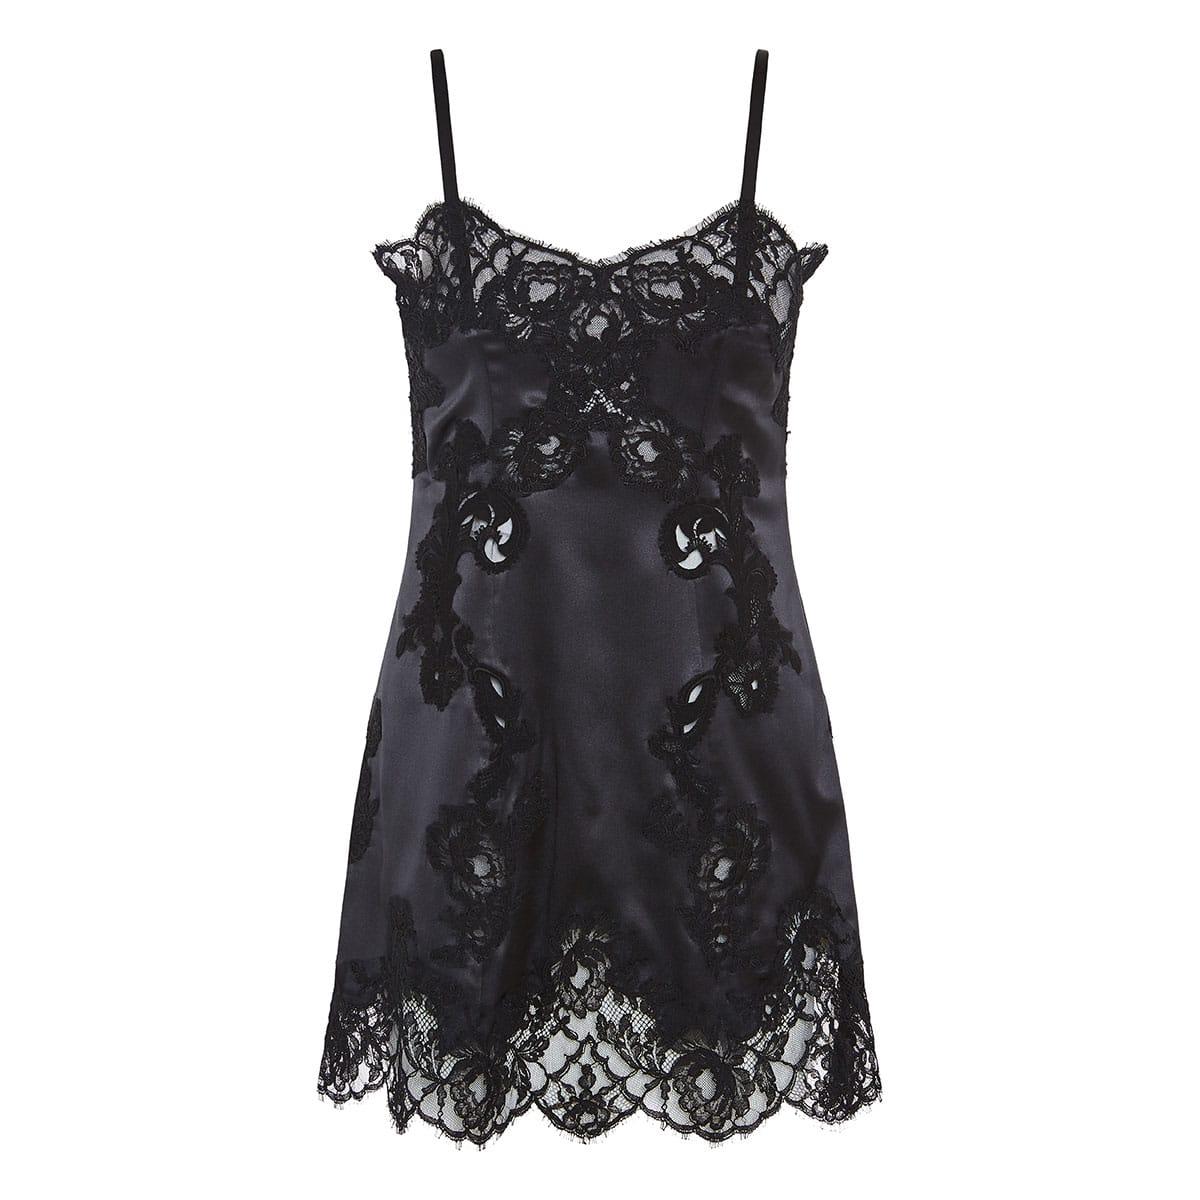 Lace-paneled satin slip dress